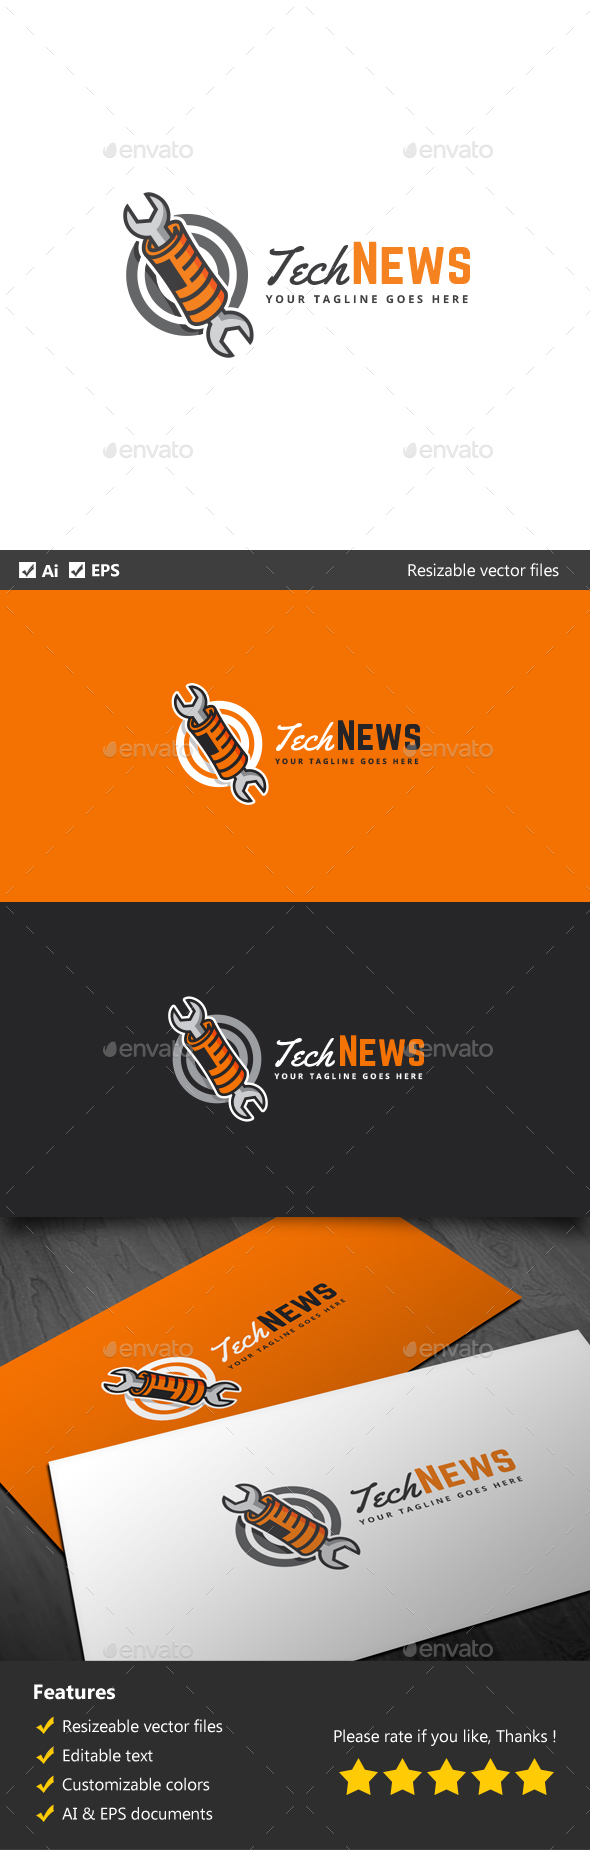 Tech News - Objects Logo Templates